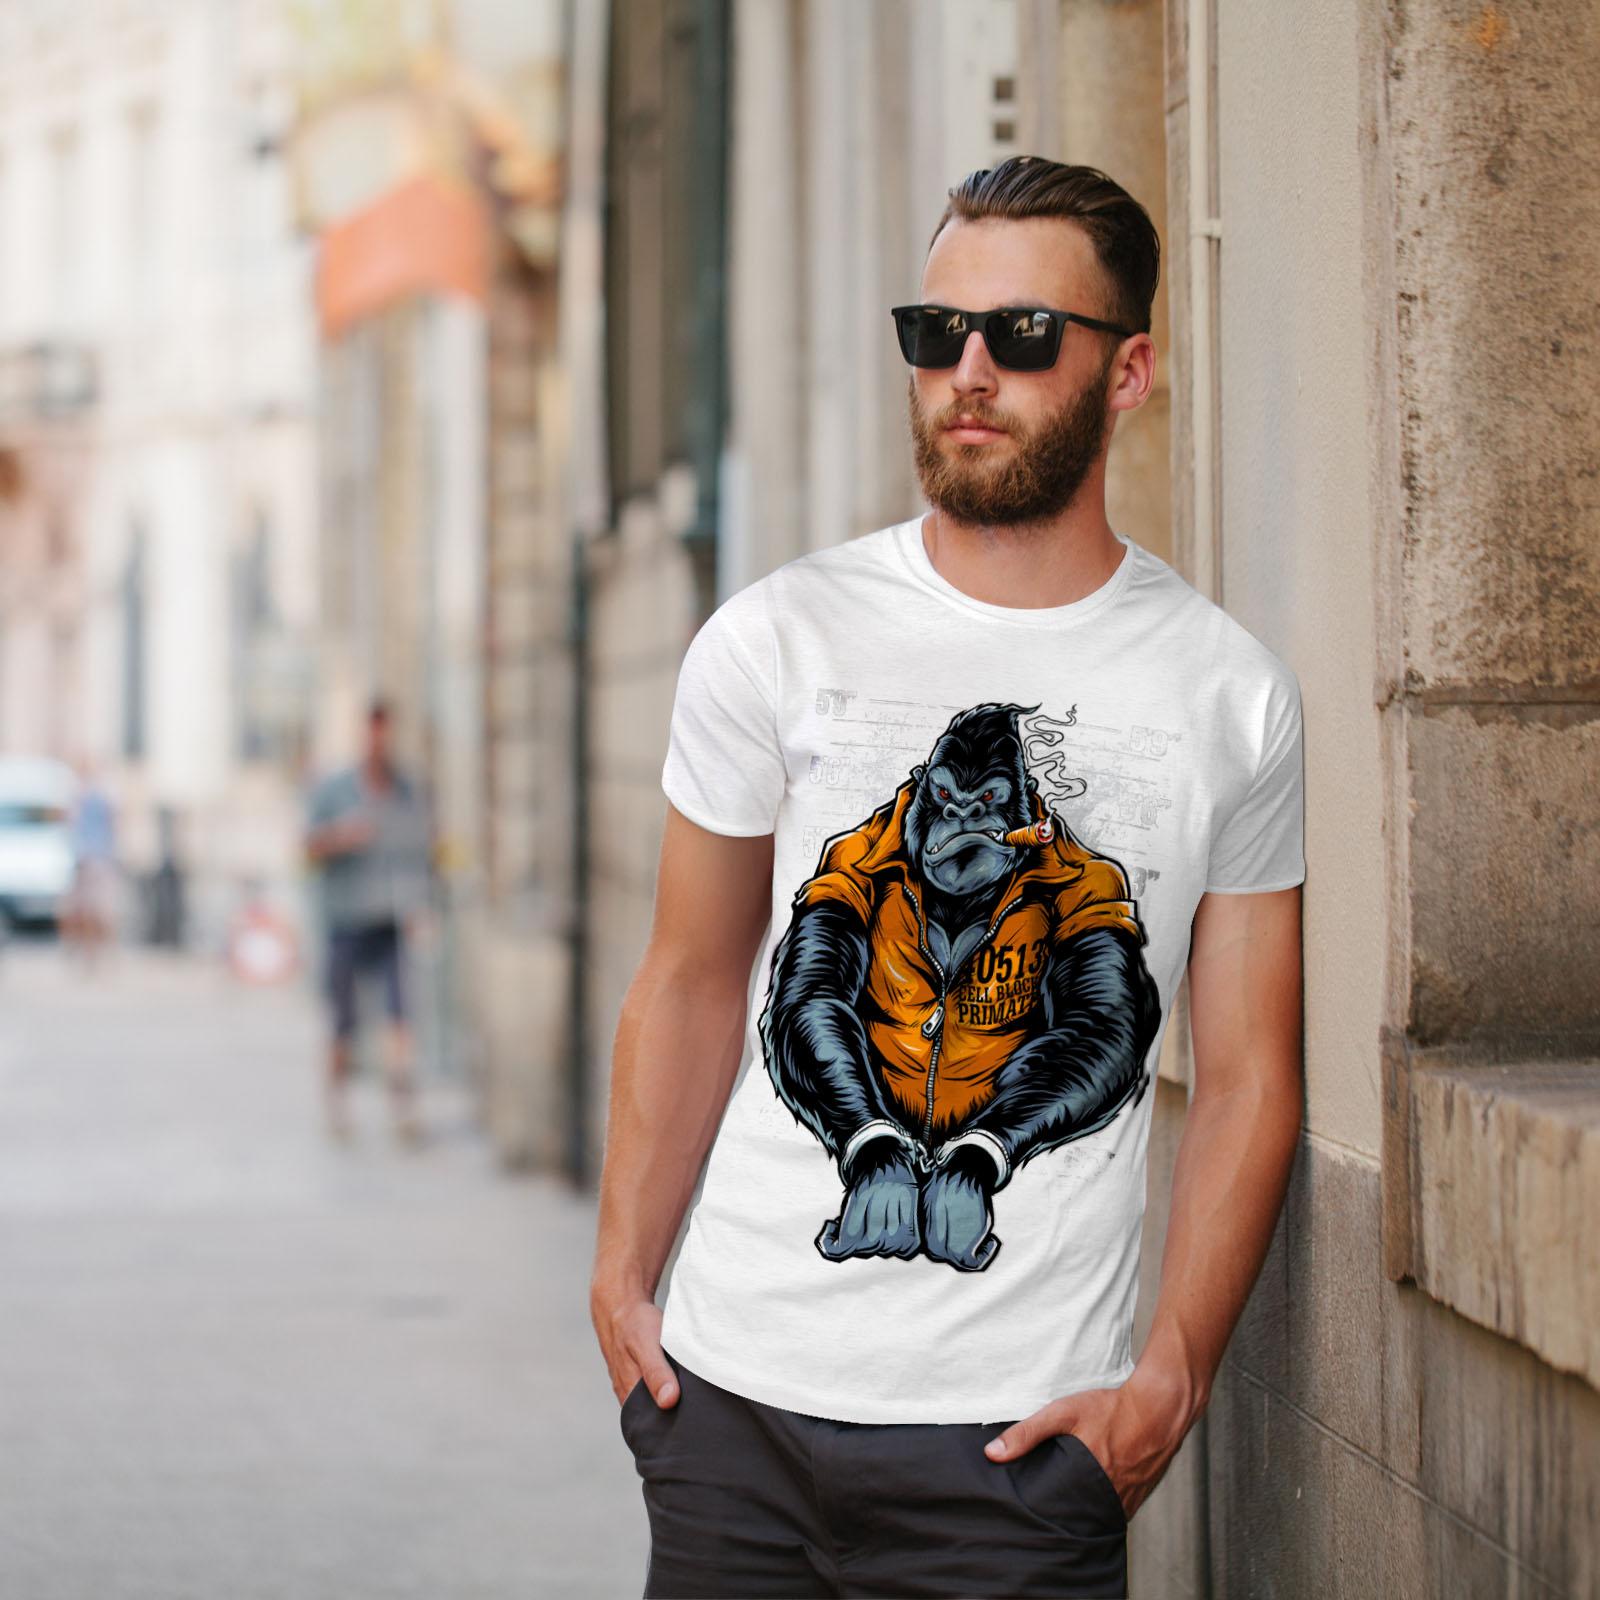 Wellcoda-Monkey-Ape-Prison-Mens-T-shirt-Wild-Graphic-Design-Printed-Tee thumbnail 11